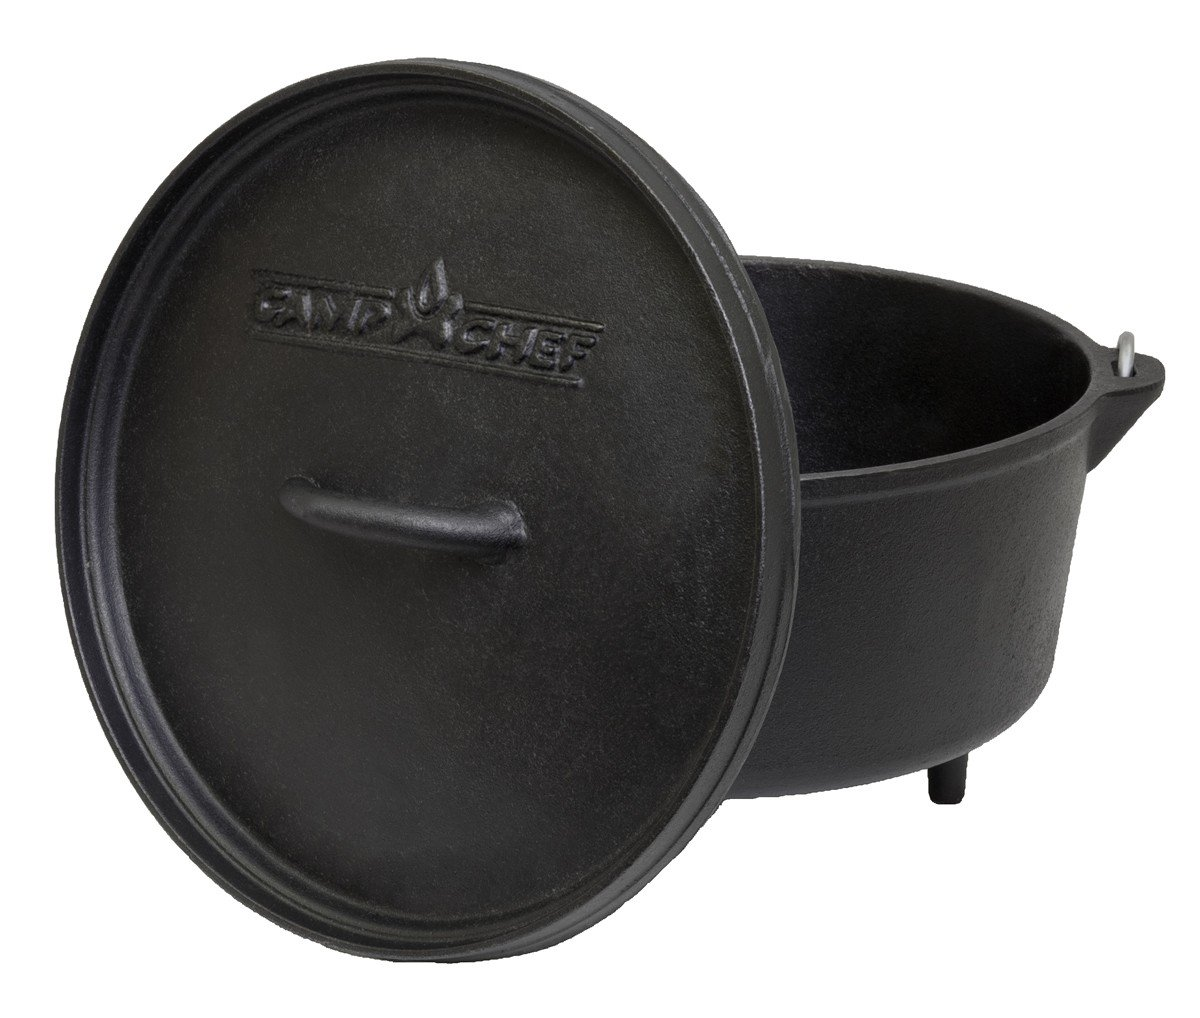 Camp Chef Classic 10-Inch Deep Prong Horn Tru Seasoned Cast Iron Dutch Oven